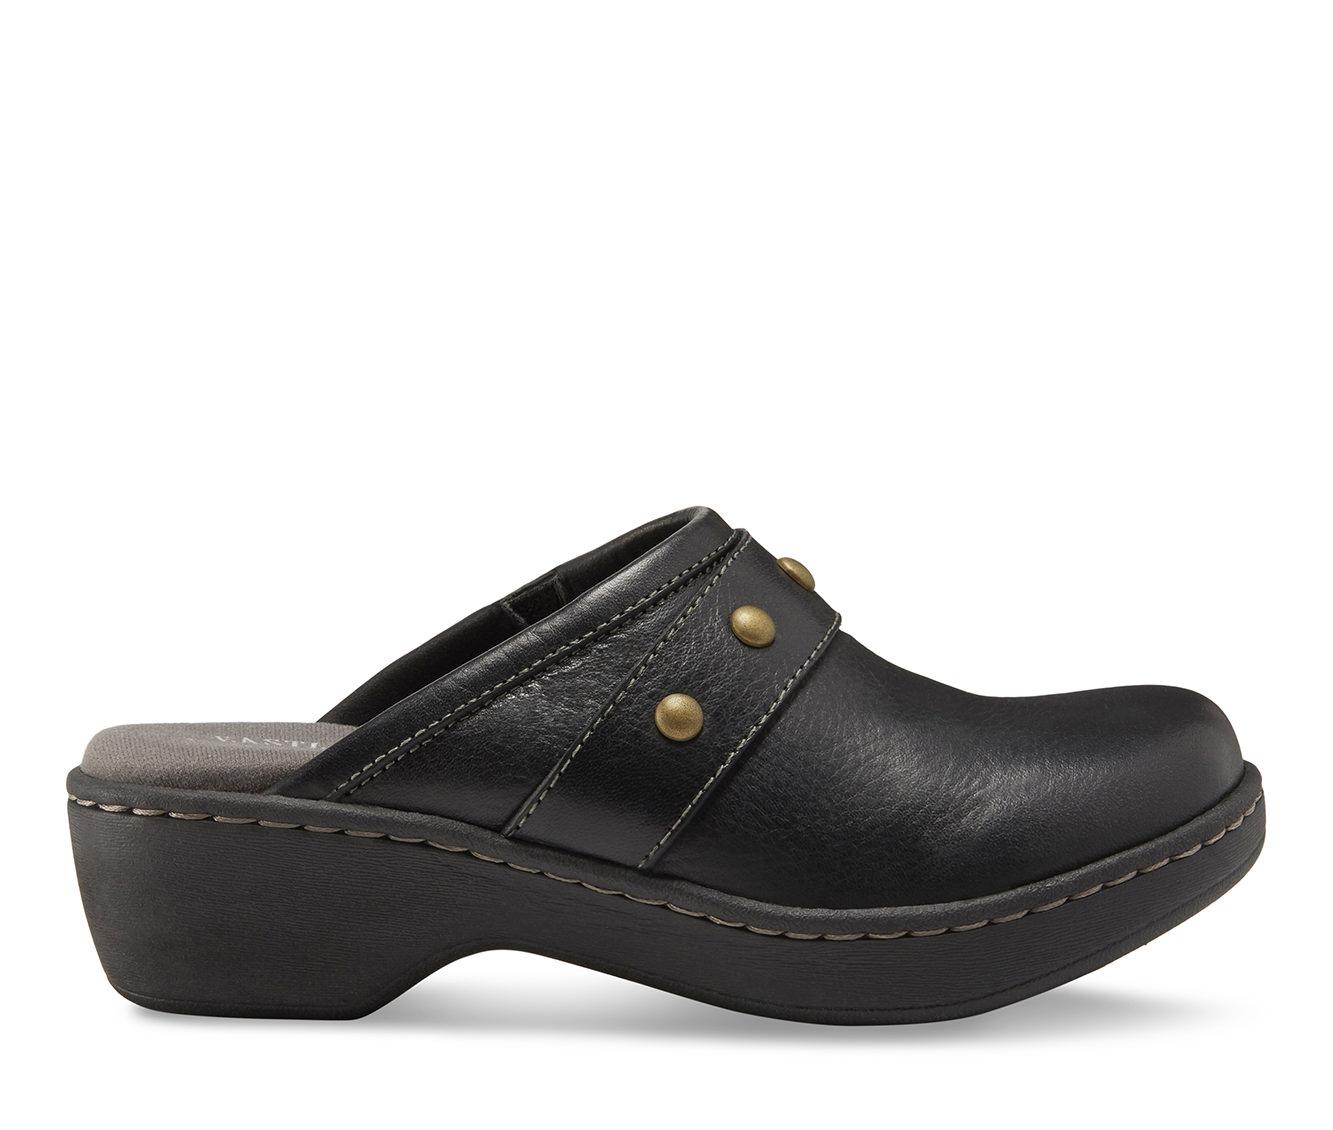 Eastland Gabriella Women's Shoe (Black Leather)